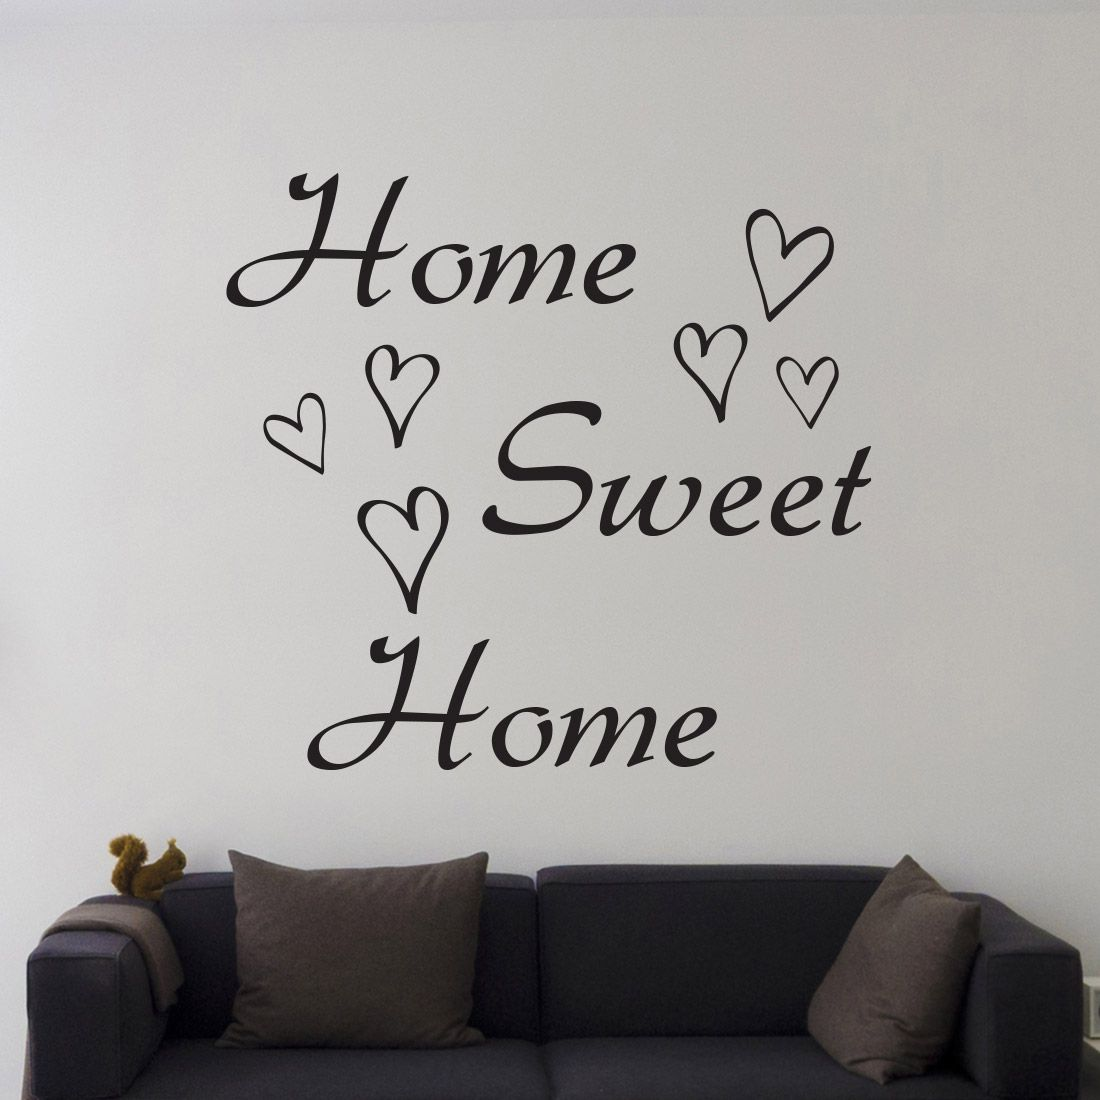 Muursticker Home Sweet Home.Muursticker Home Sweet Home Muurteksten Muurstickers